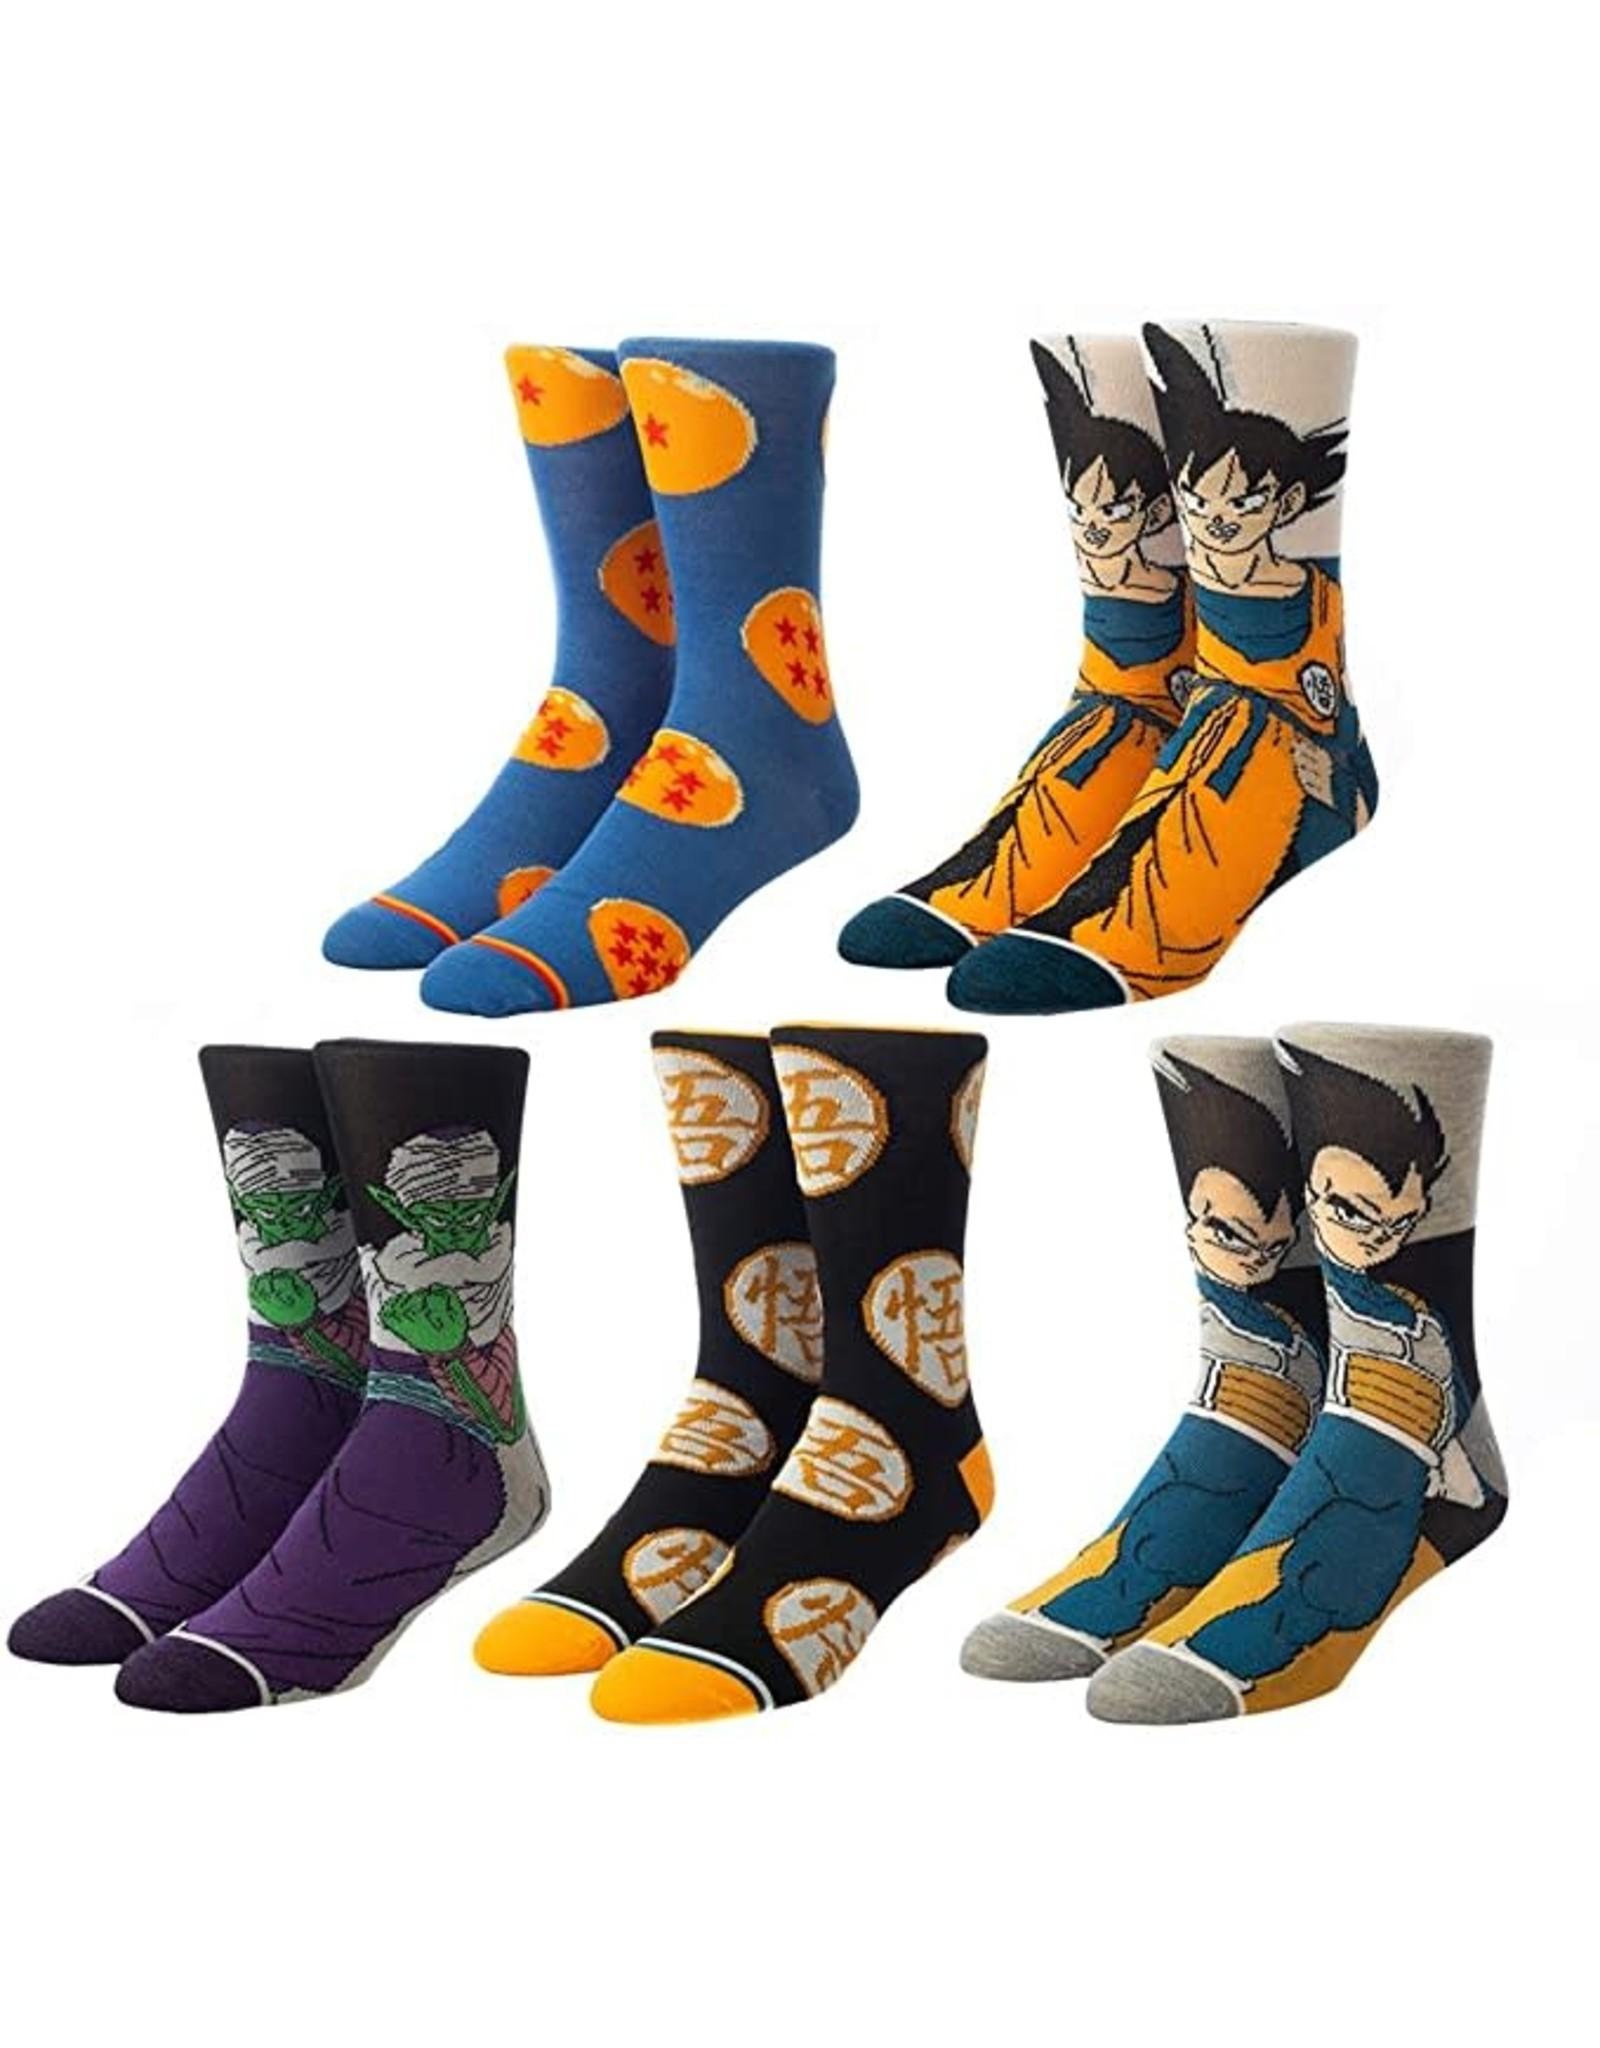 Bioworld Dragon Ball 5 Pack Mens Crew Socks